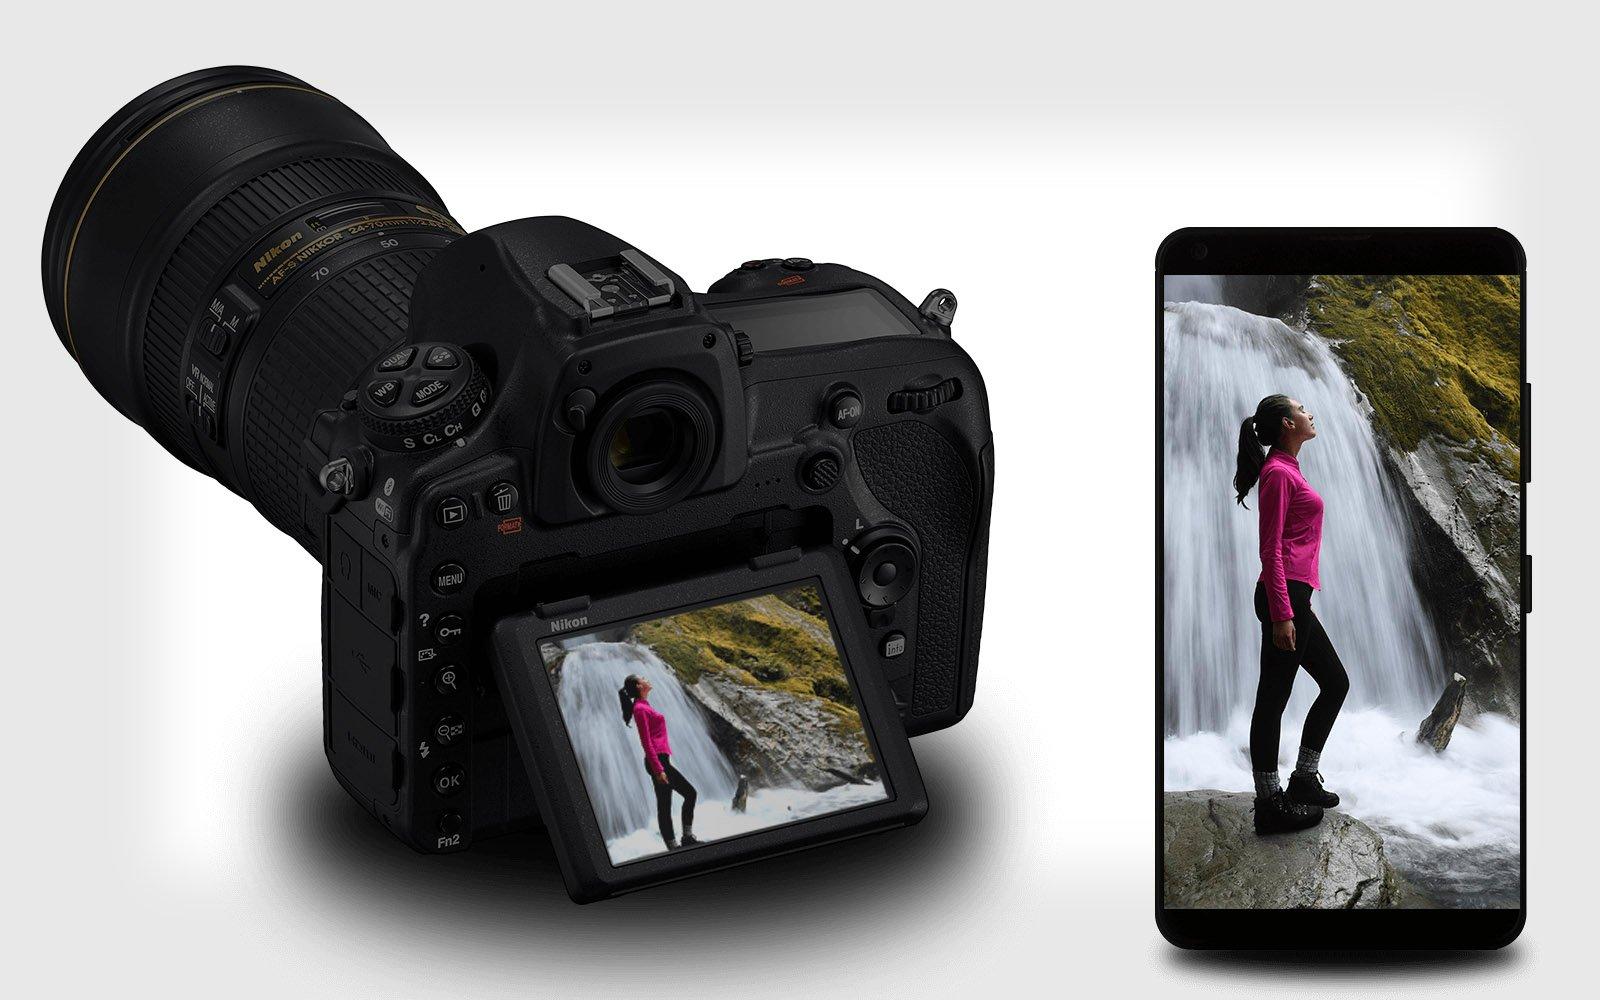 Nikon Has Finally Added RAW Image Transfer to the SnapBridge App